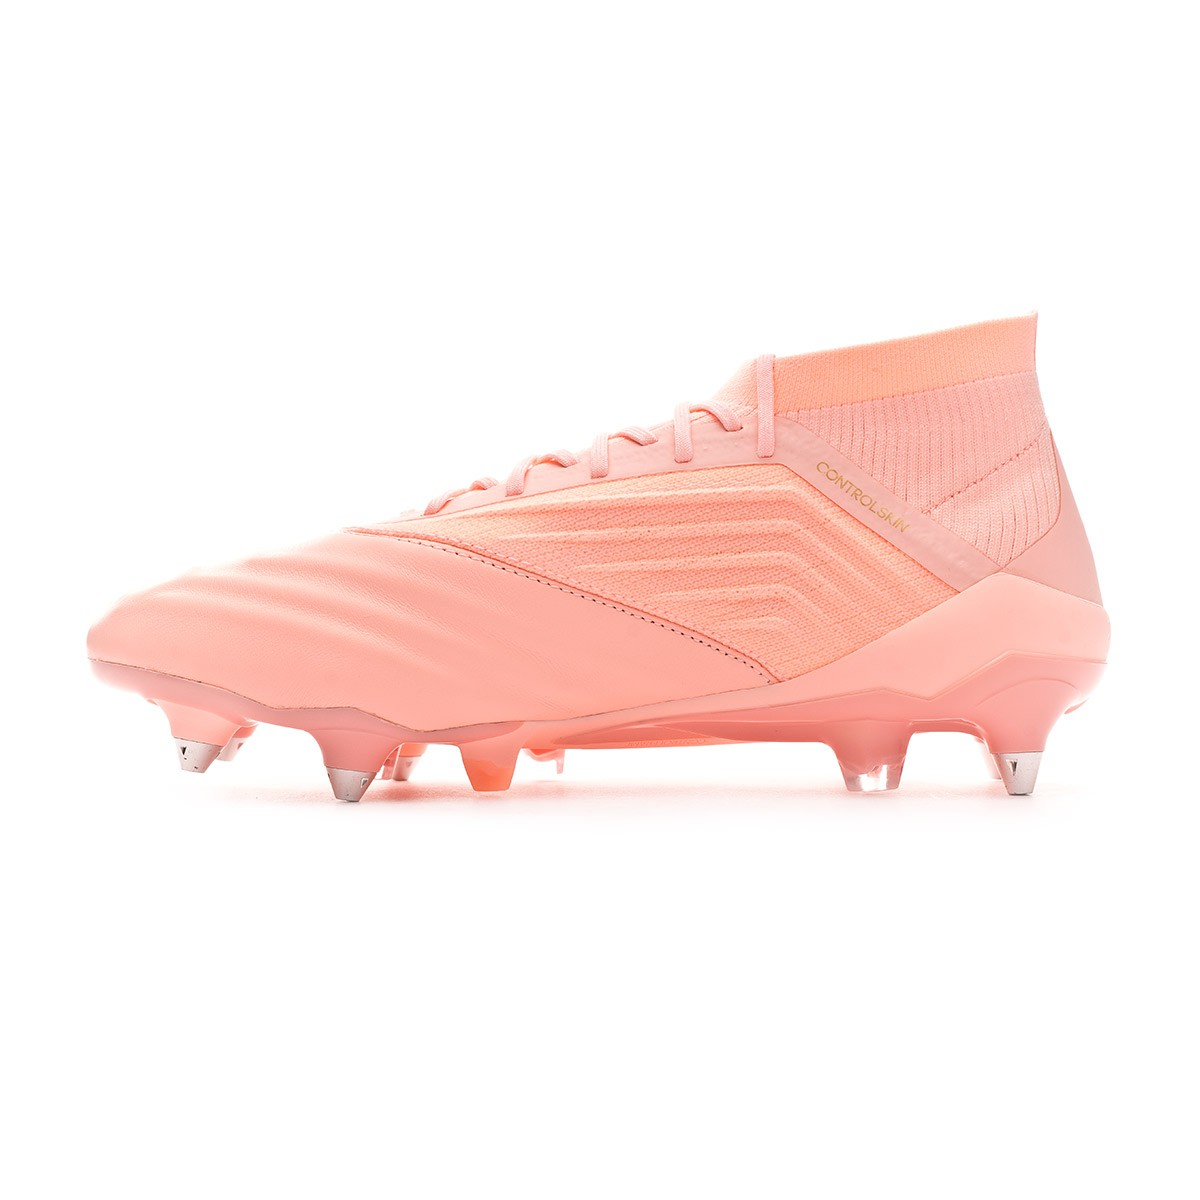 ... Bota Predator 18.1 SG Piel Clear orange-Trace pink. CATEGORY. Football  boots · adidas football boots 9f32db0d08752